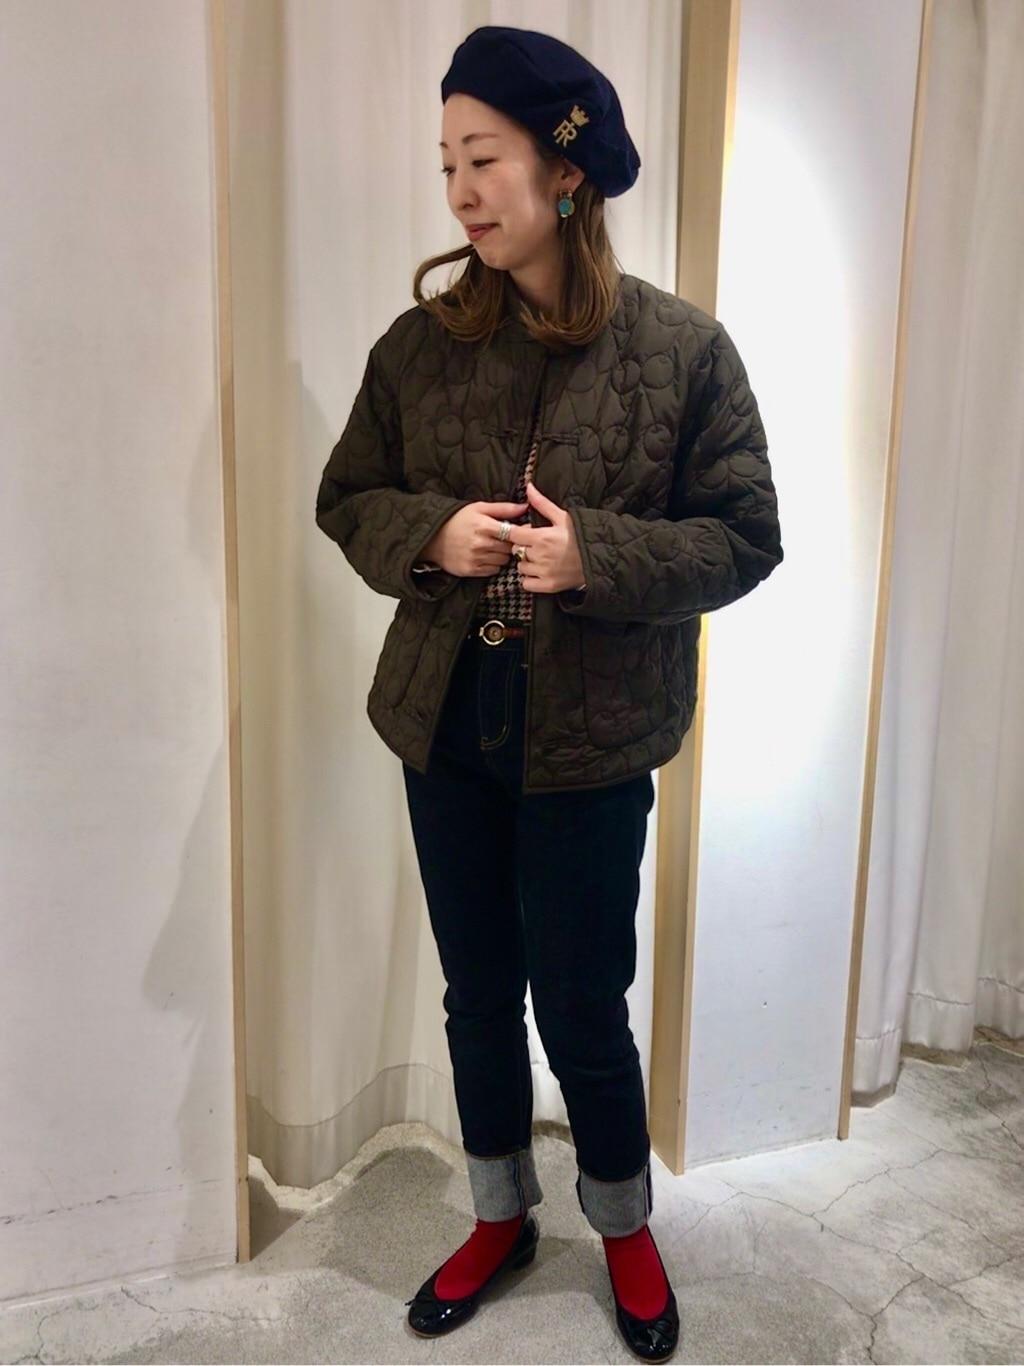 Dot and Stripes CHILD WOMAN ペリエ千葉 身長:155cm 2019.12.06